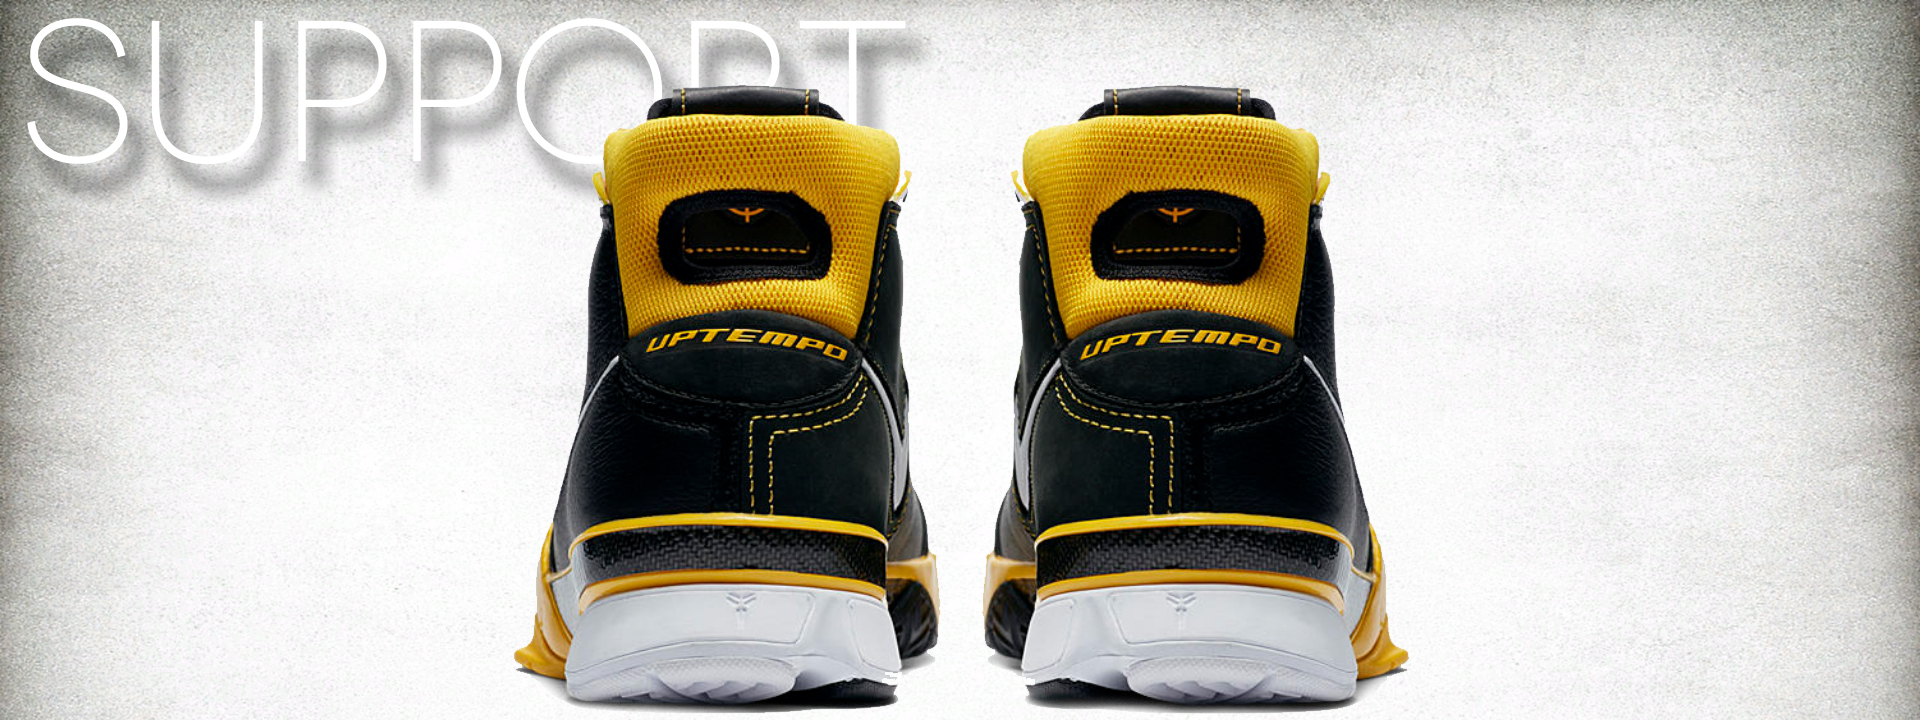 a55c2762baf Nike Zoom Kobe 1 Protro Performance Review Duke4005 support ...